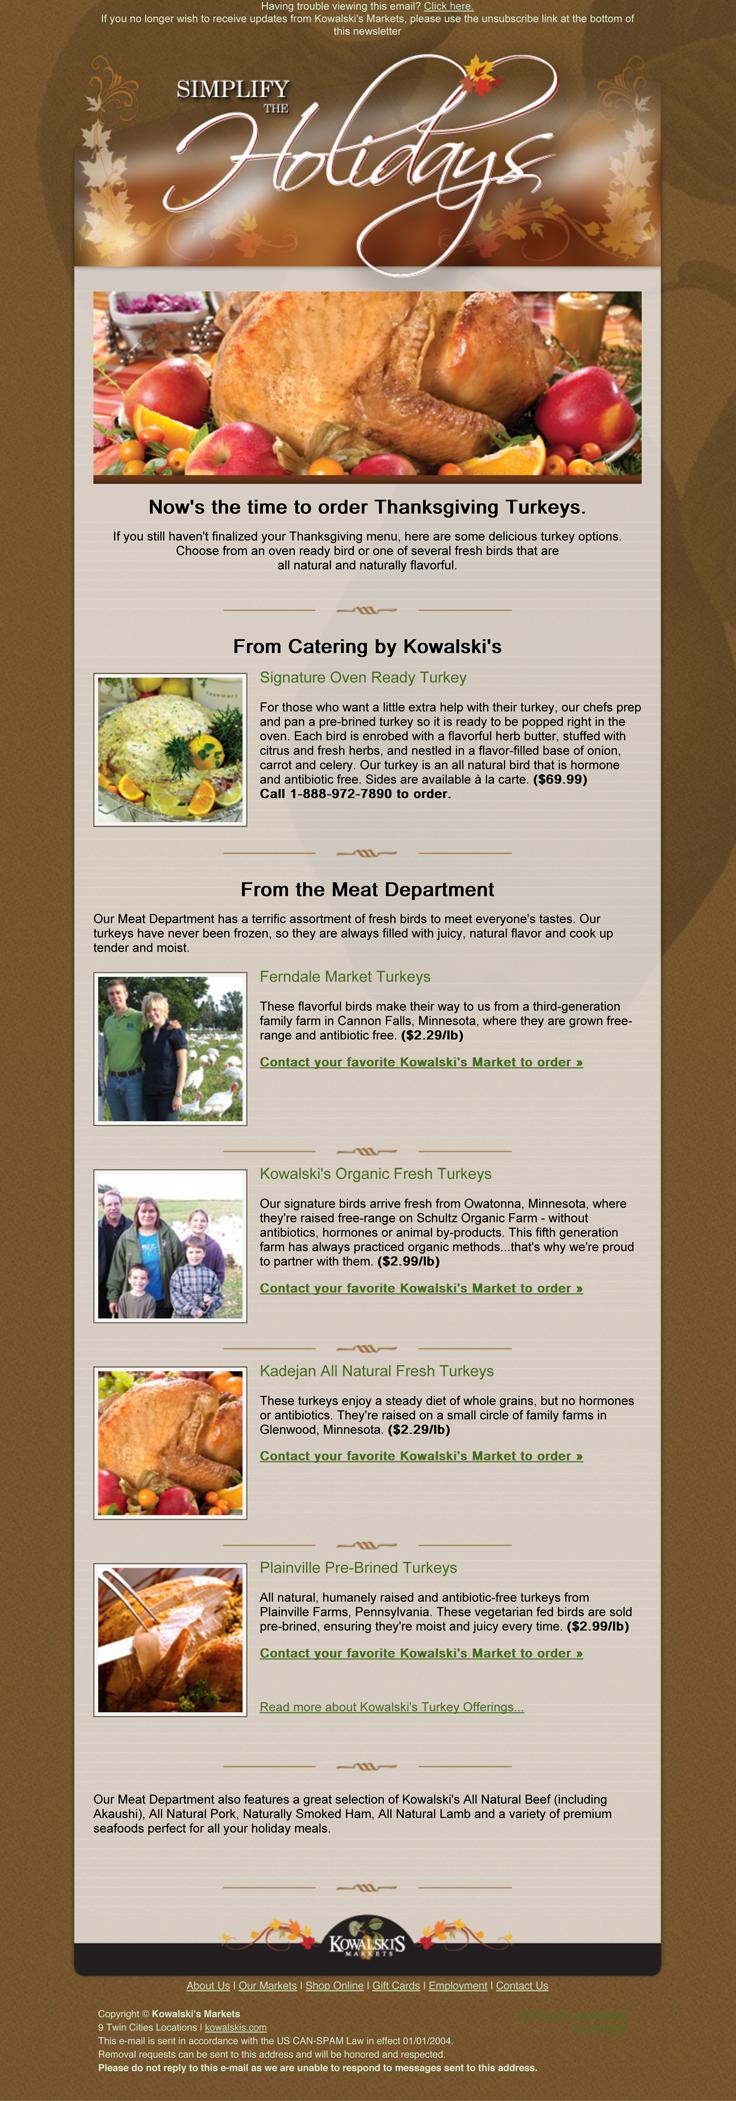 Thanksgiving Promotional Email Marketing - e-Blast, Retail | Team